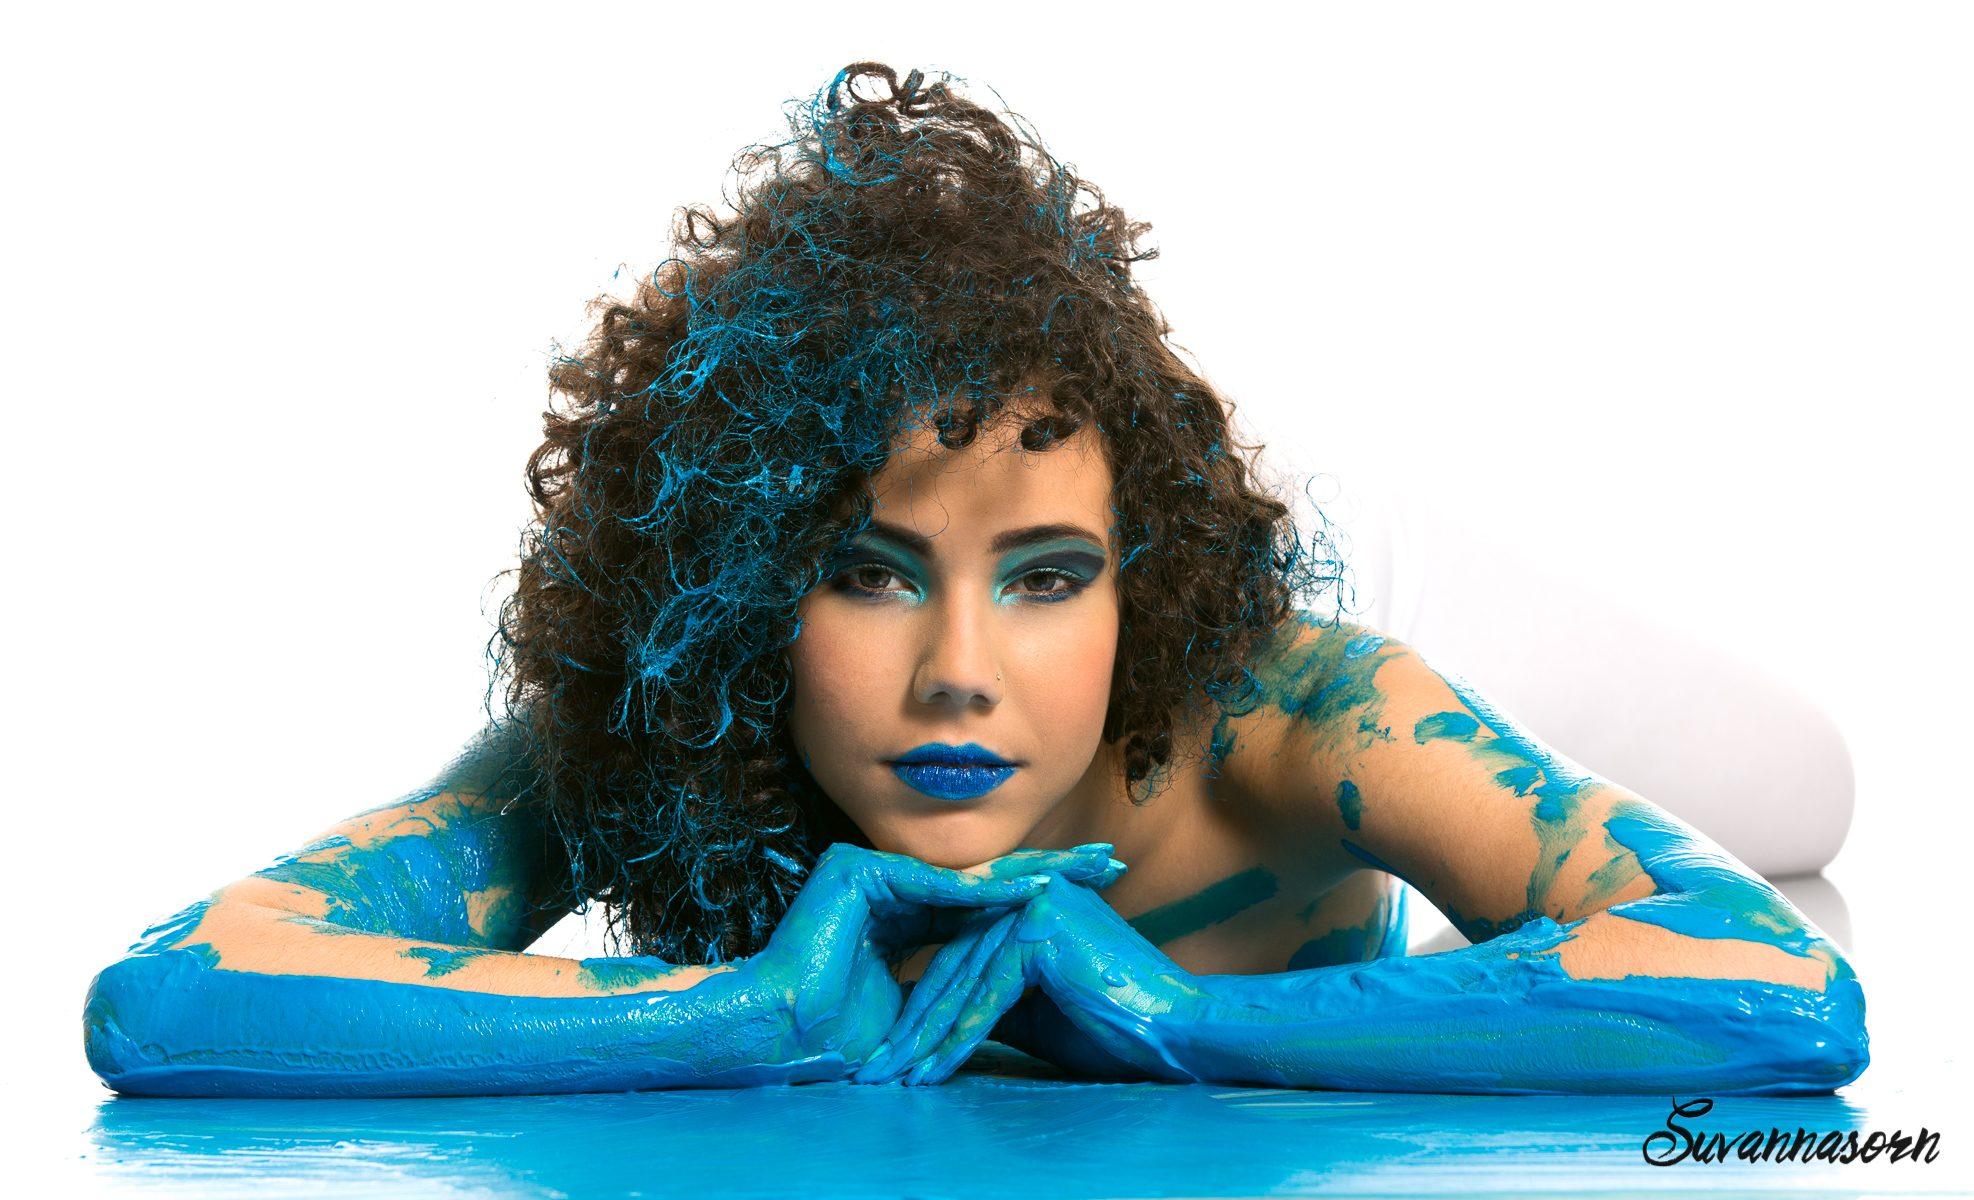 suvannasorn maquillage bleu peinture beauté femme genève maquilleuse artiste photographe